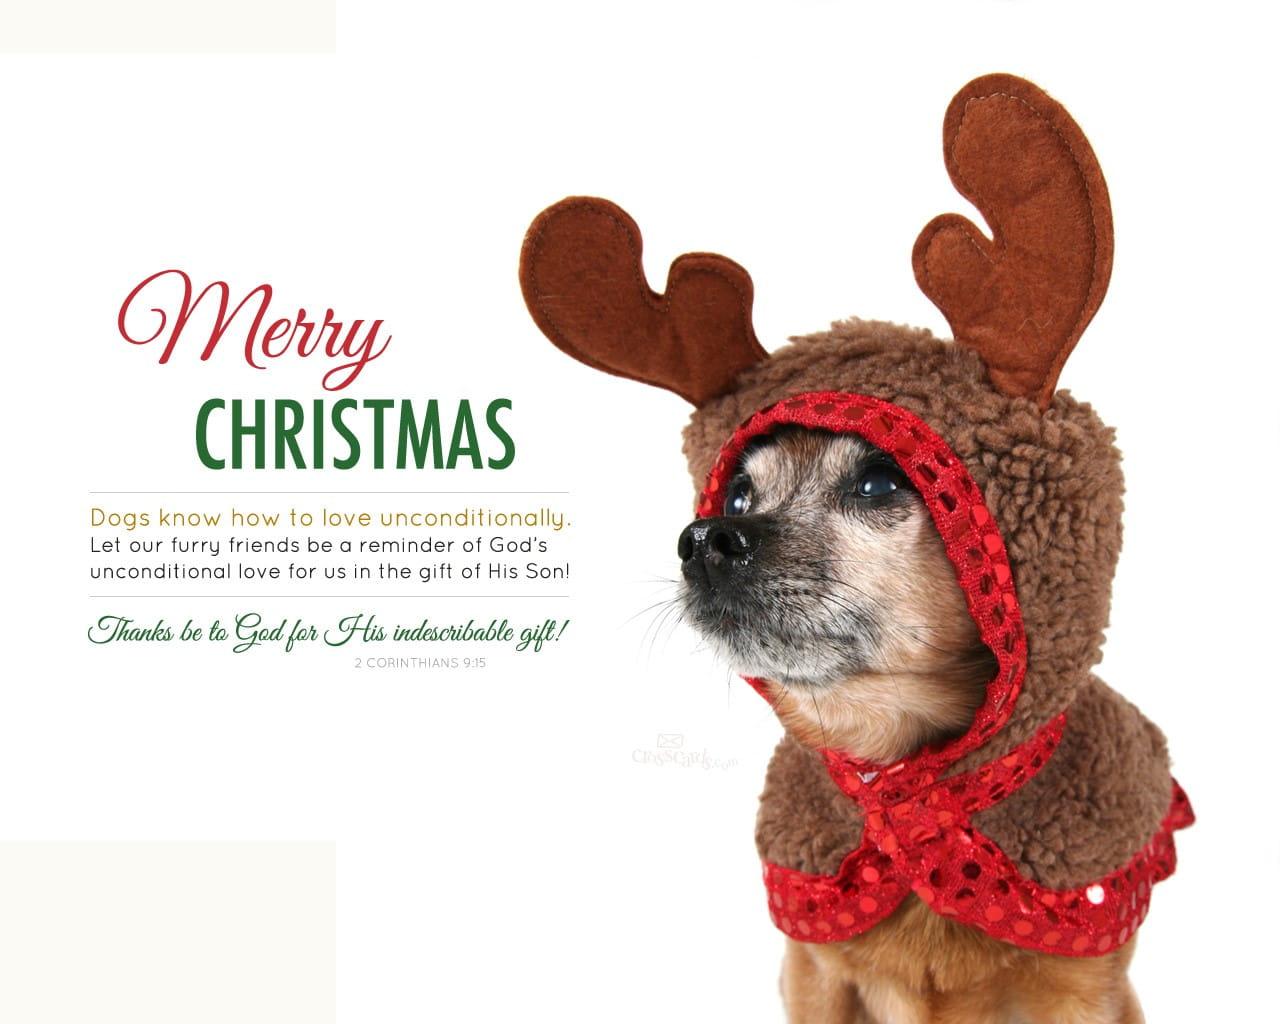 Good Wallpaper Love Merry Christmas - 24613-merry-christmas-dog-love-1280-x-1024  Trends_94837.jpg